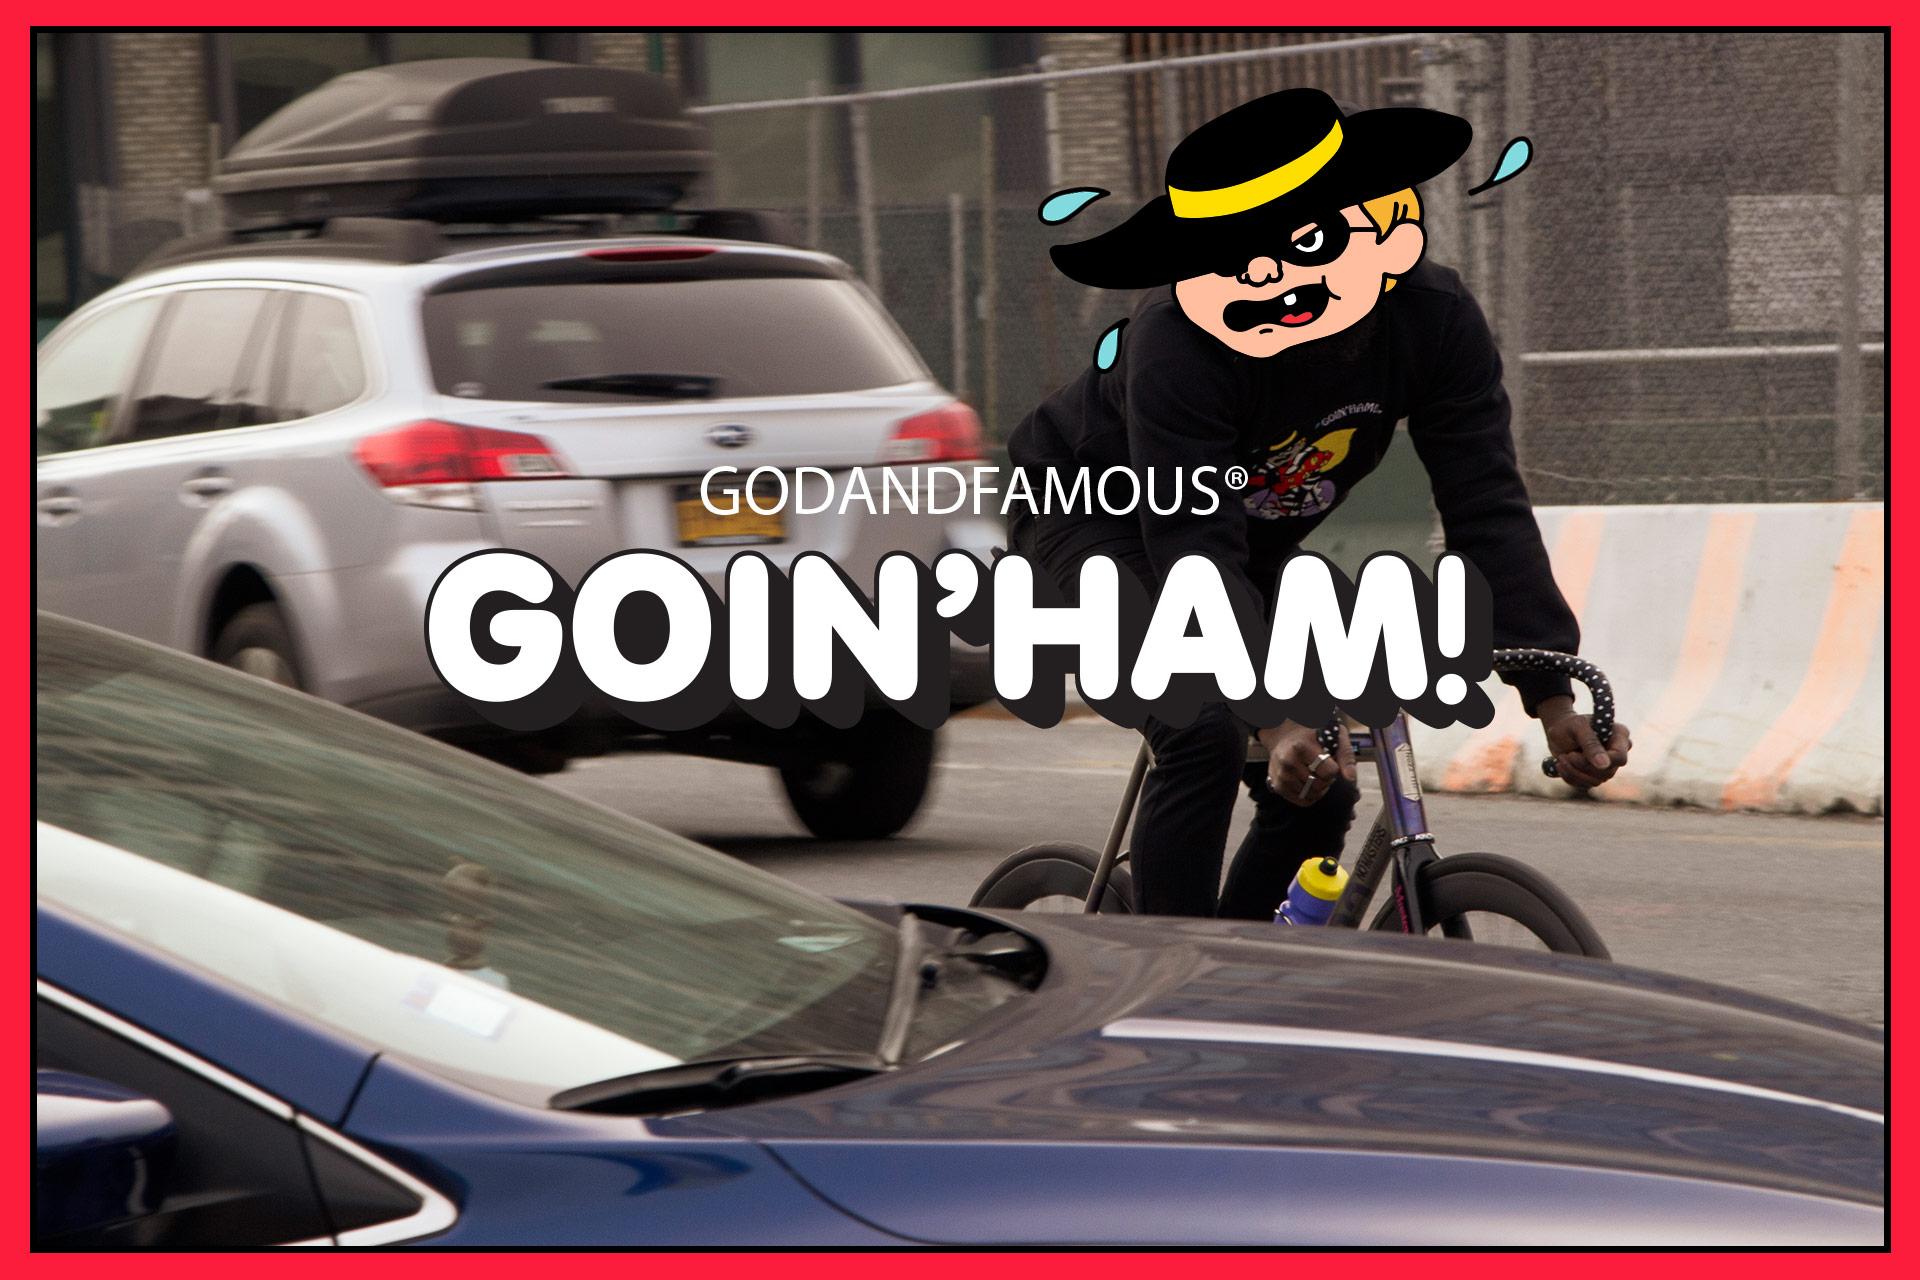 godandfamous_ham_promo_1.jpg